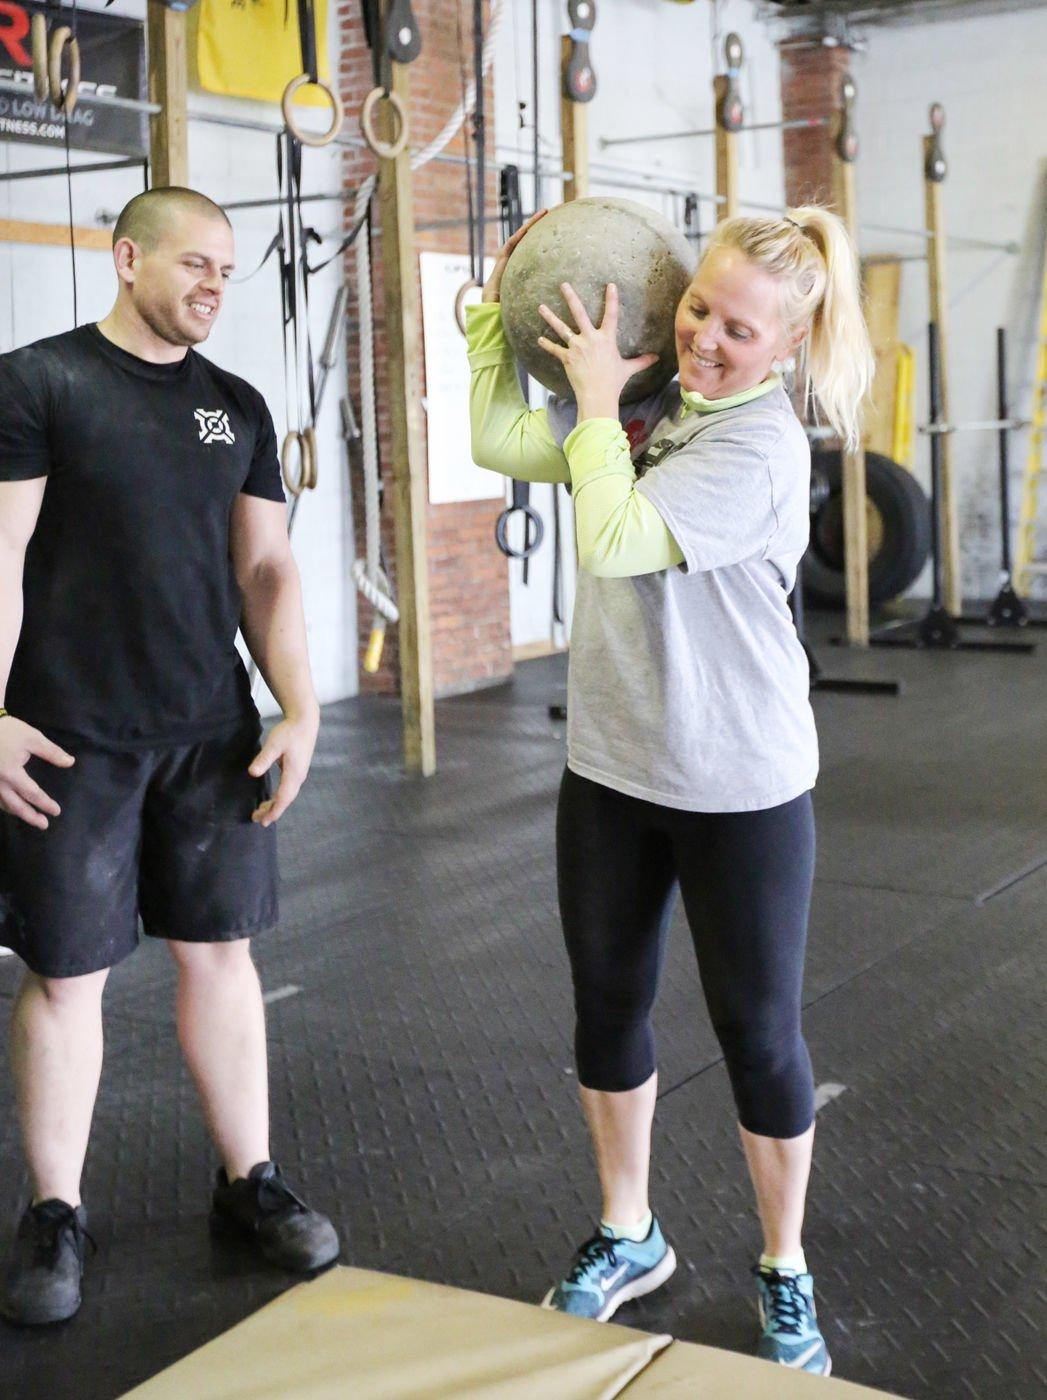 Get Fit competitors get taste of Strongman stones | Get Fit